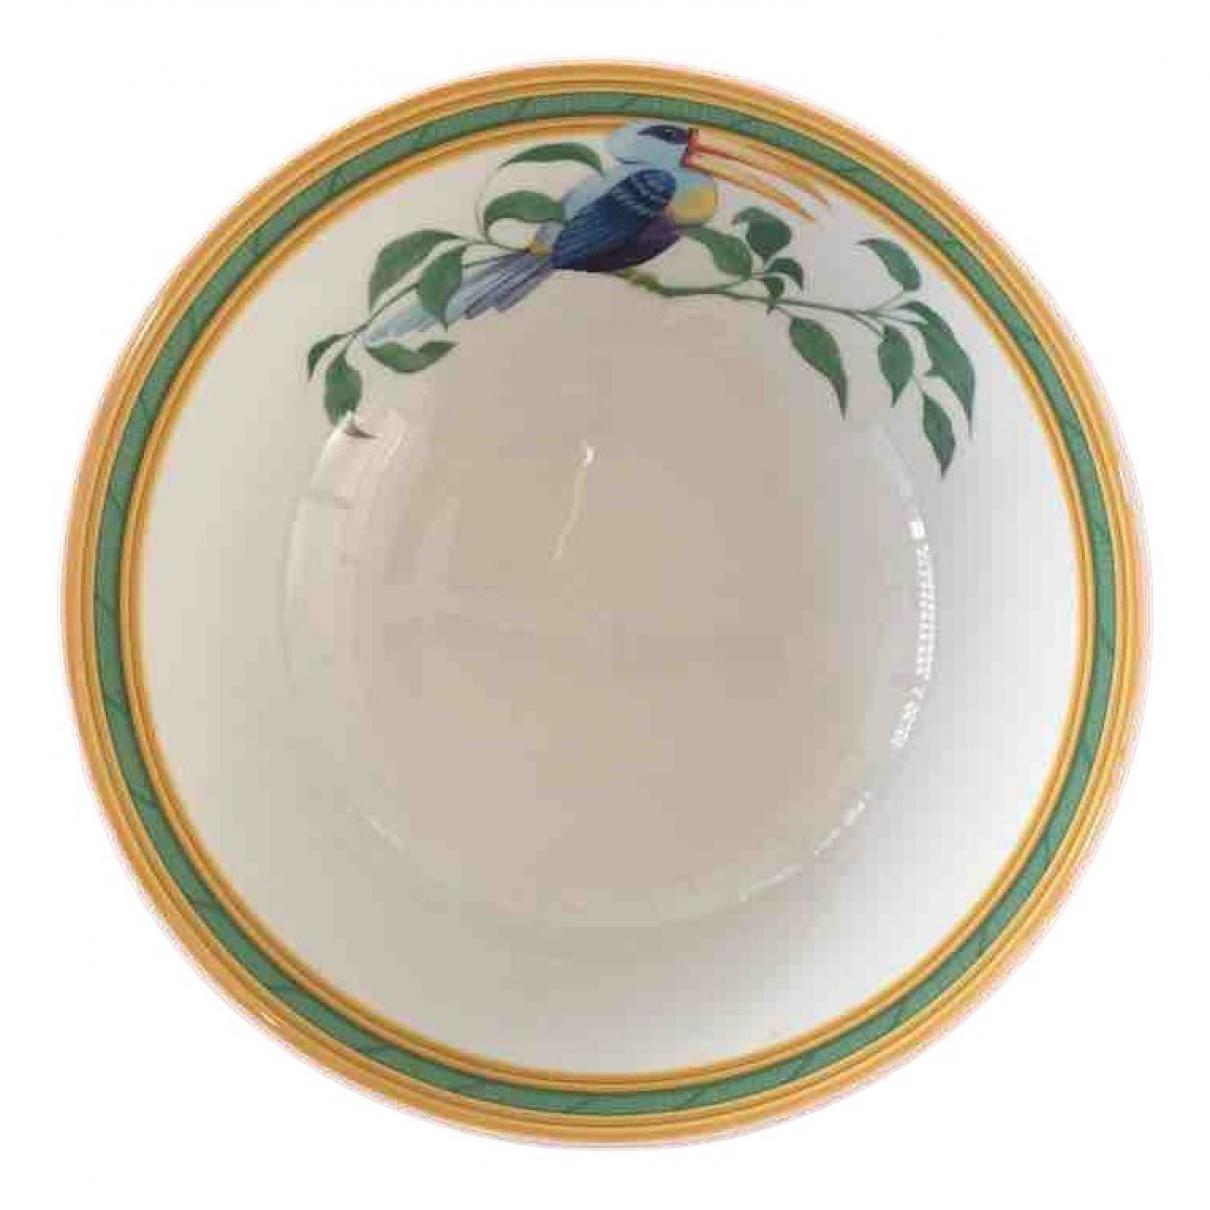 Ensaladera Toucans de Porcelana Hermes